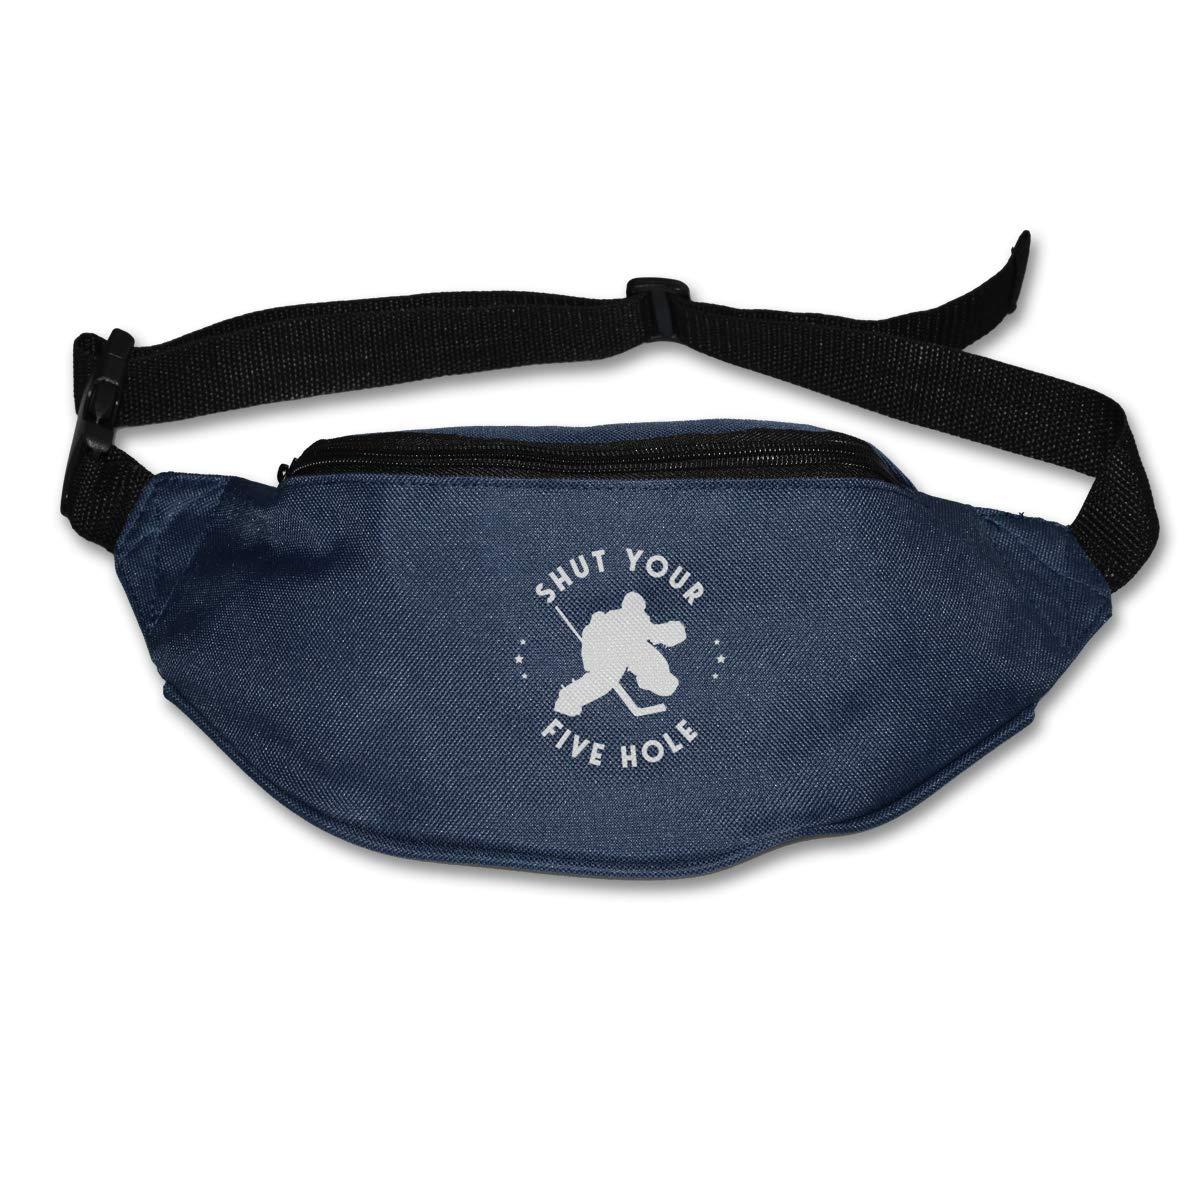 Shut Your Five Hole Sport Waist Bag Fanny Pack Adjustable For Travel